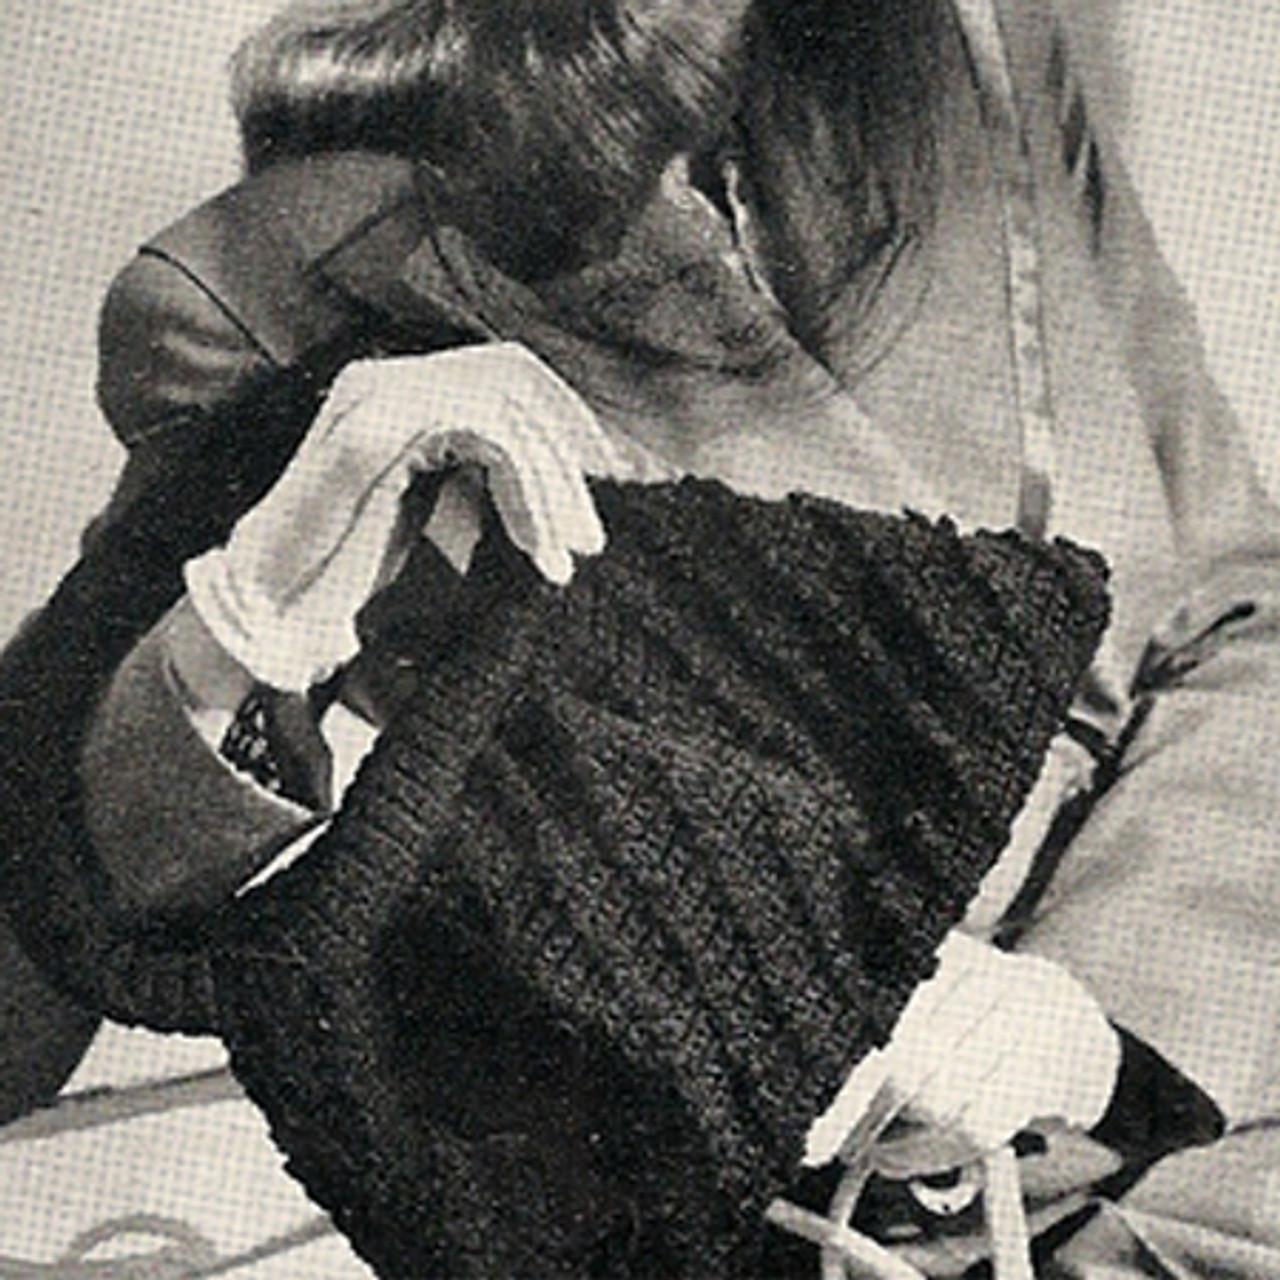 Vintage Crocheted Purse Pattern